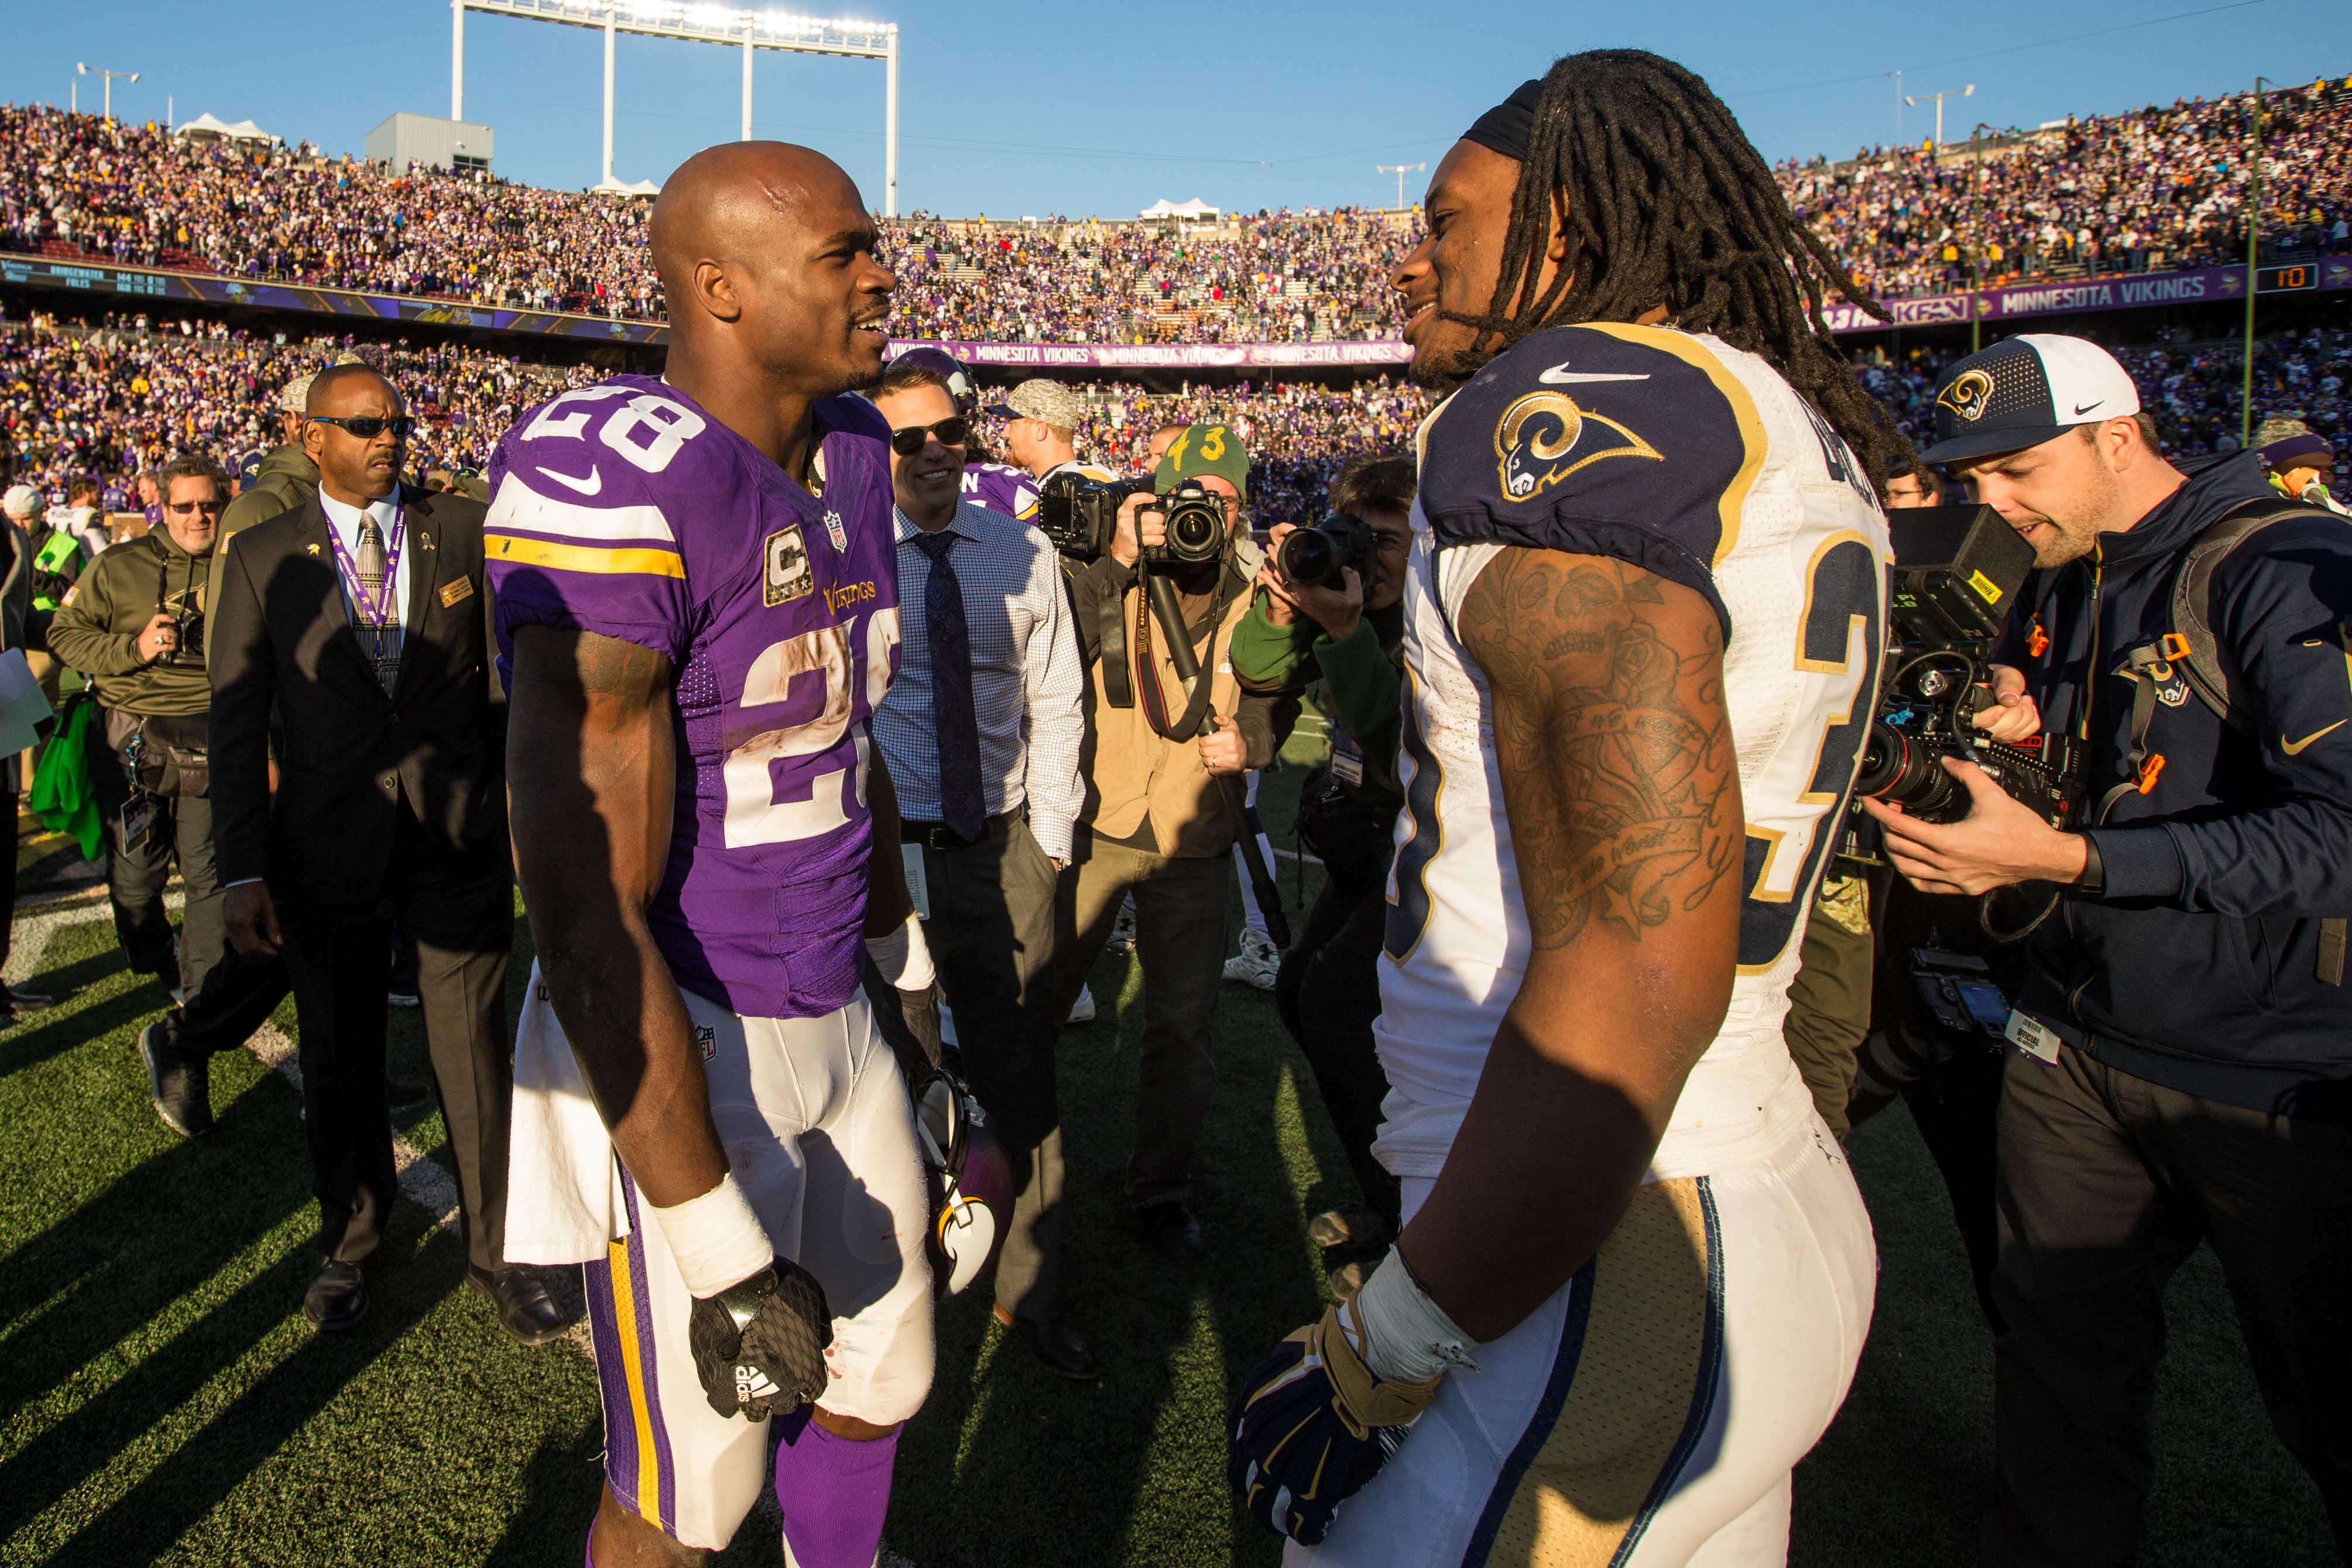 NFL: St. Louis Rams at Minnesota Vikings